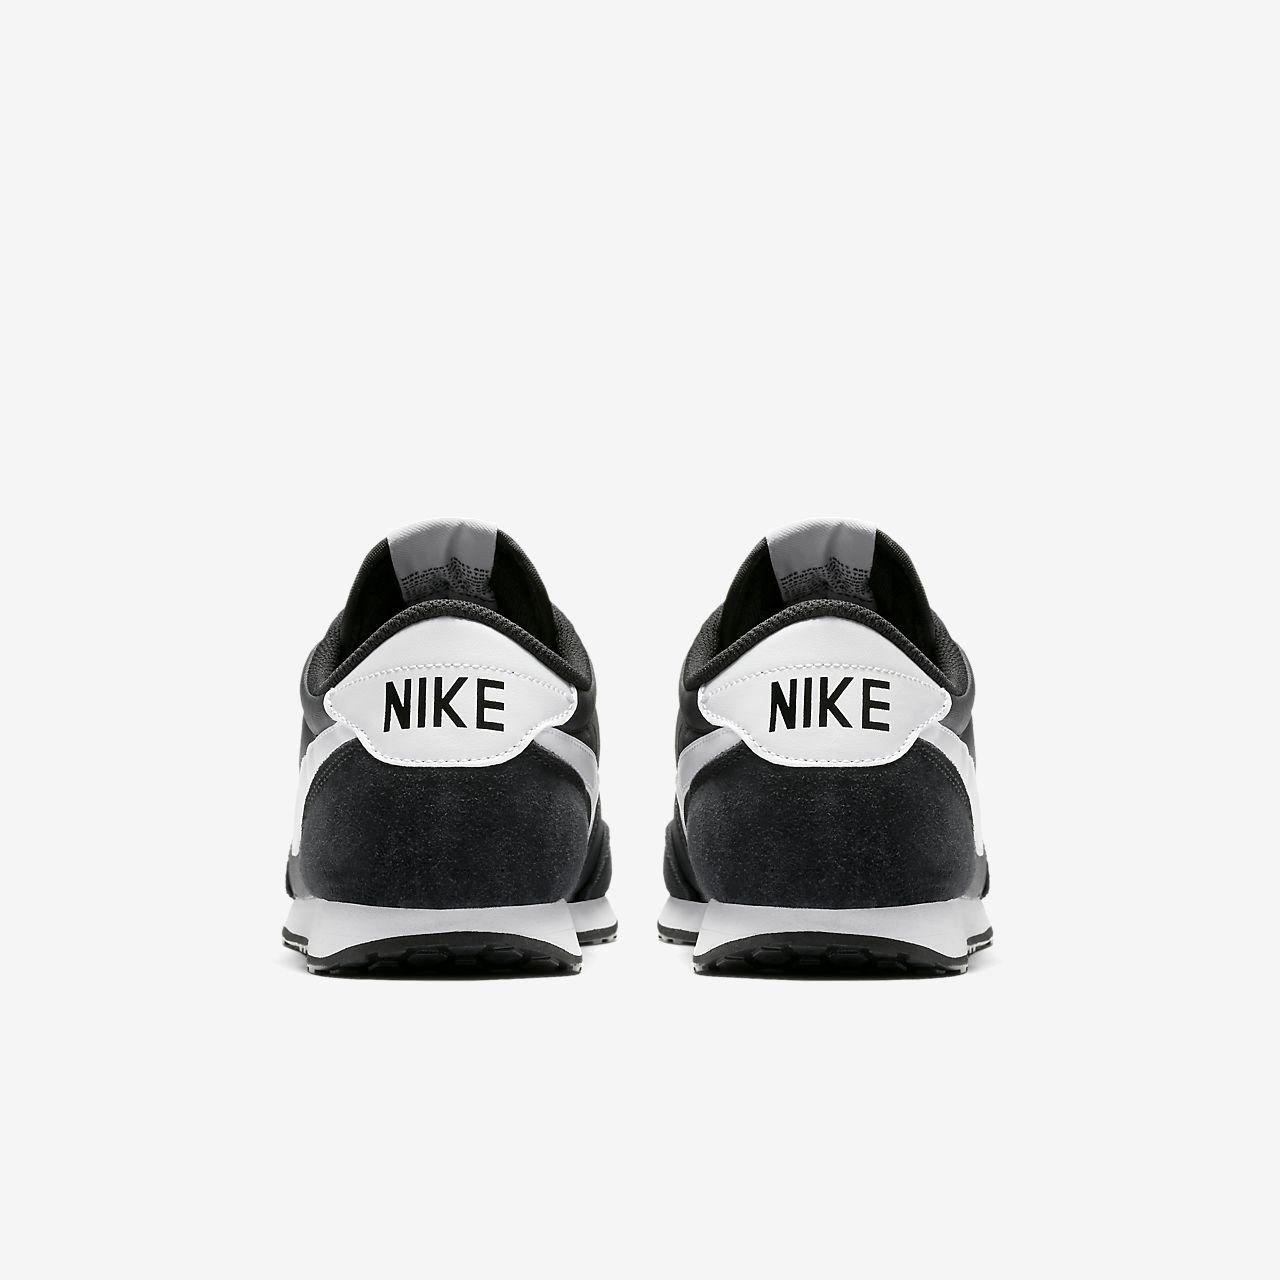 b371974ab1586 Nike Mach Runner Men s Shoe. Nike.com CA